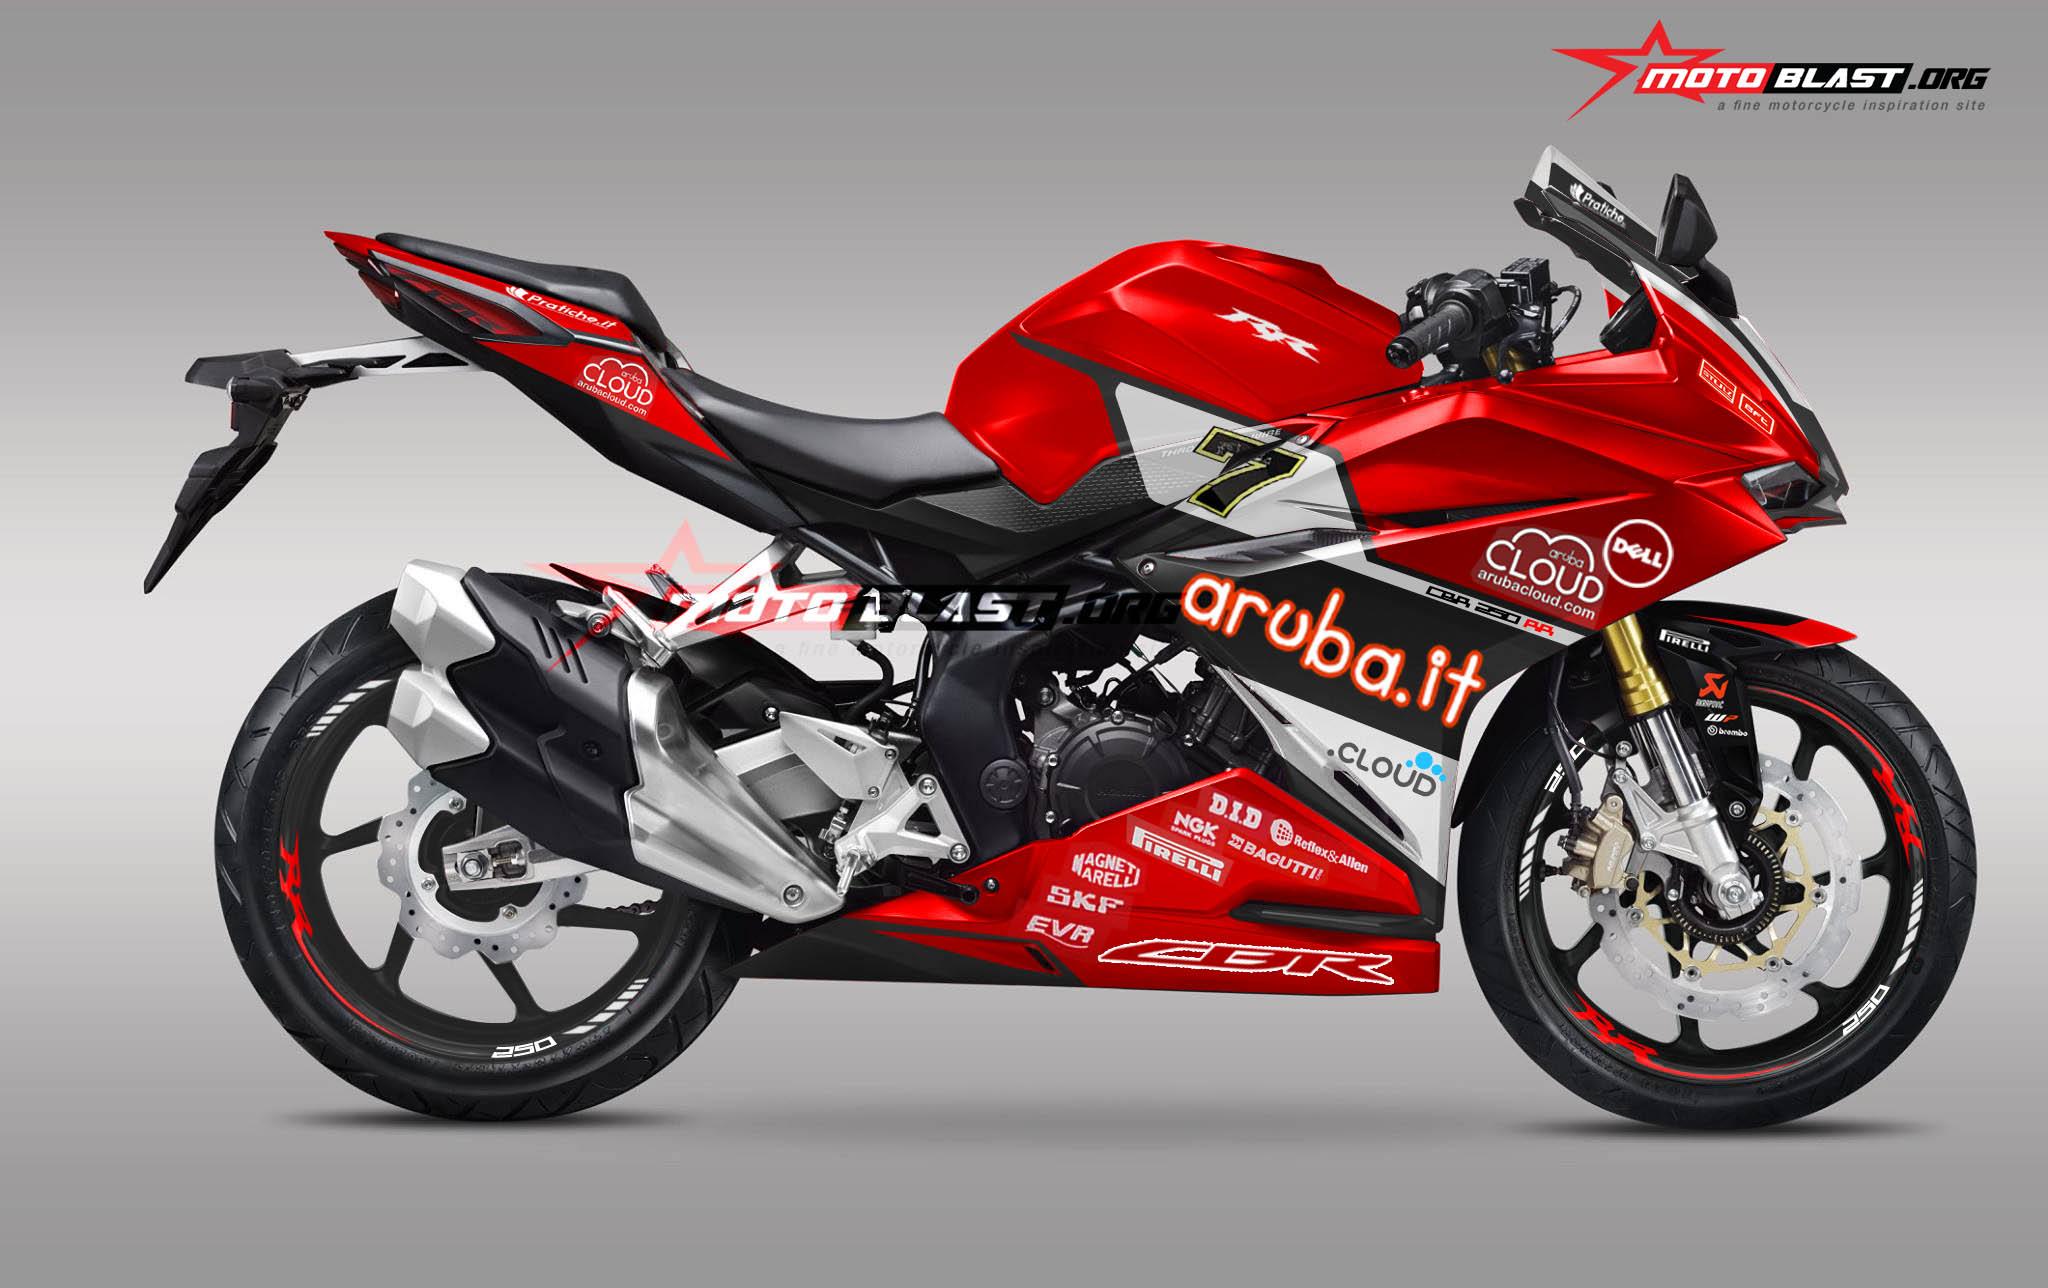 CBR250RR-RED ARUBA IT WSBK 2016